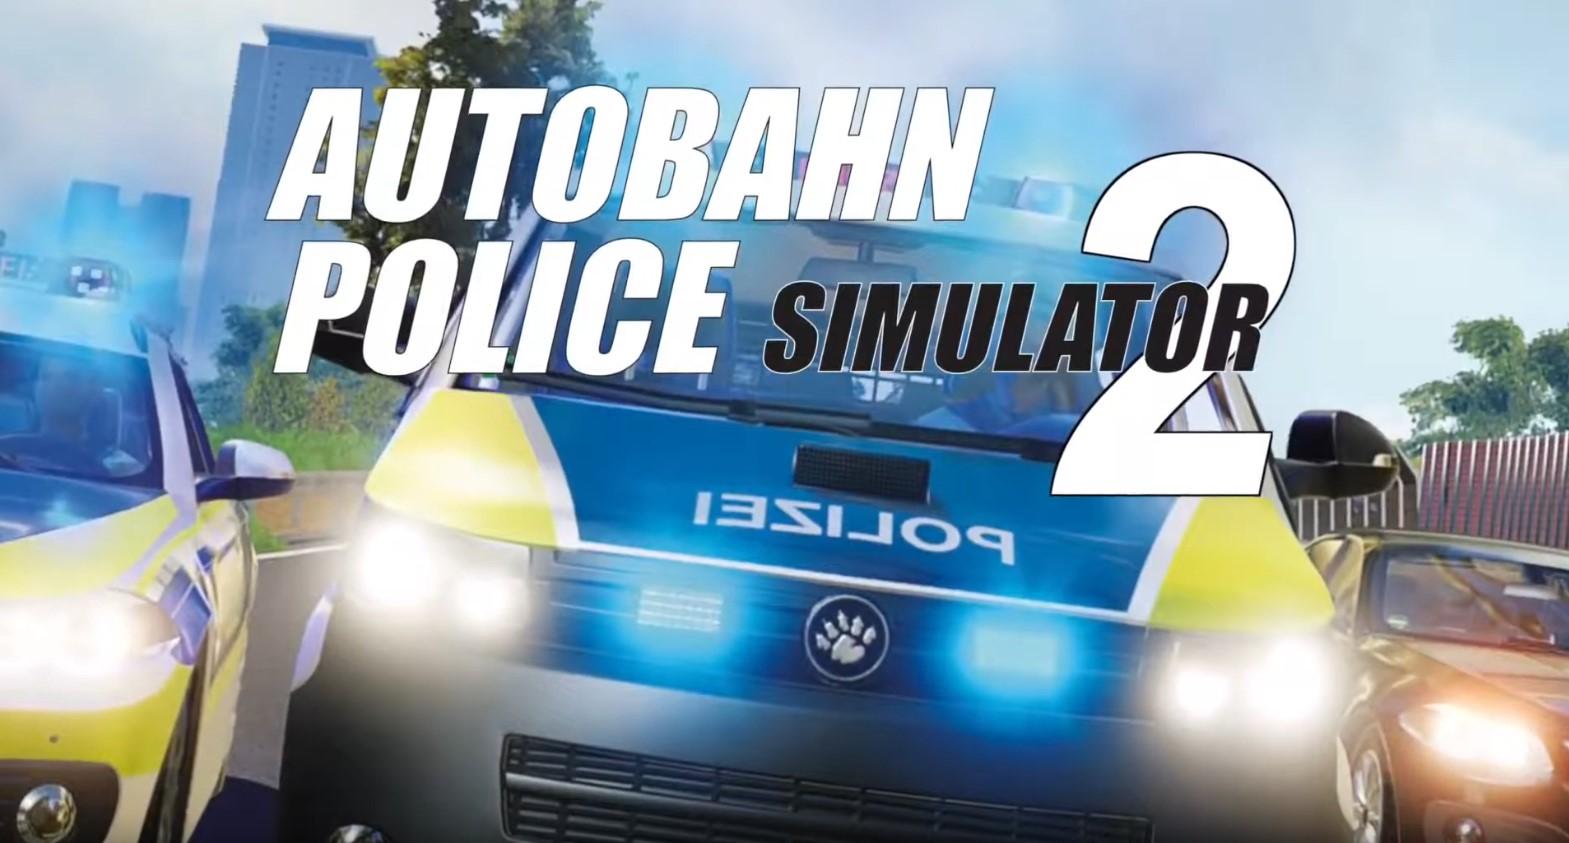 autobahn-police-simulator-2-on-xboxone